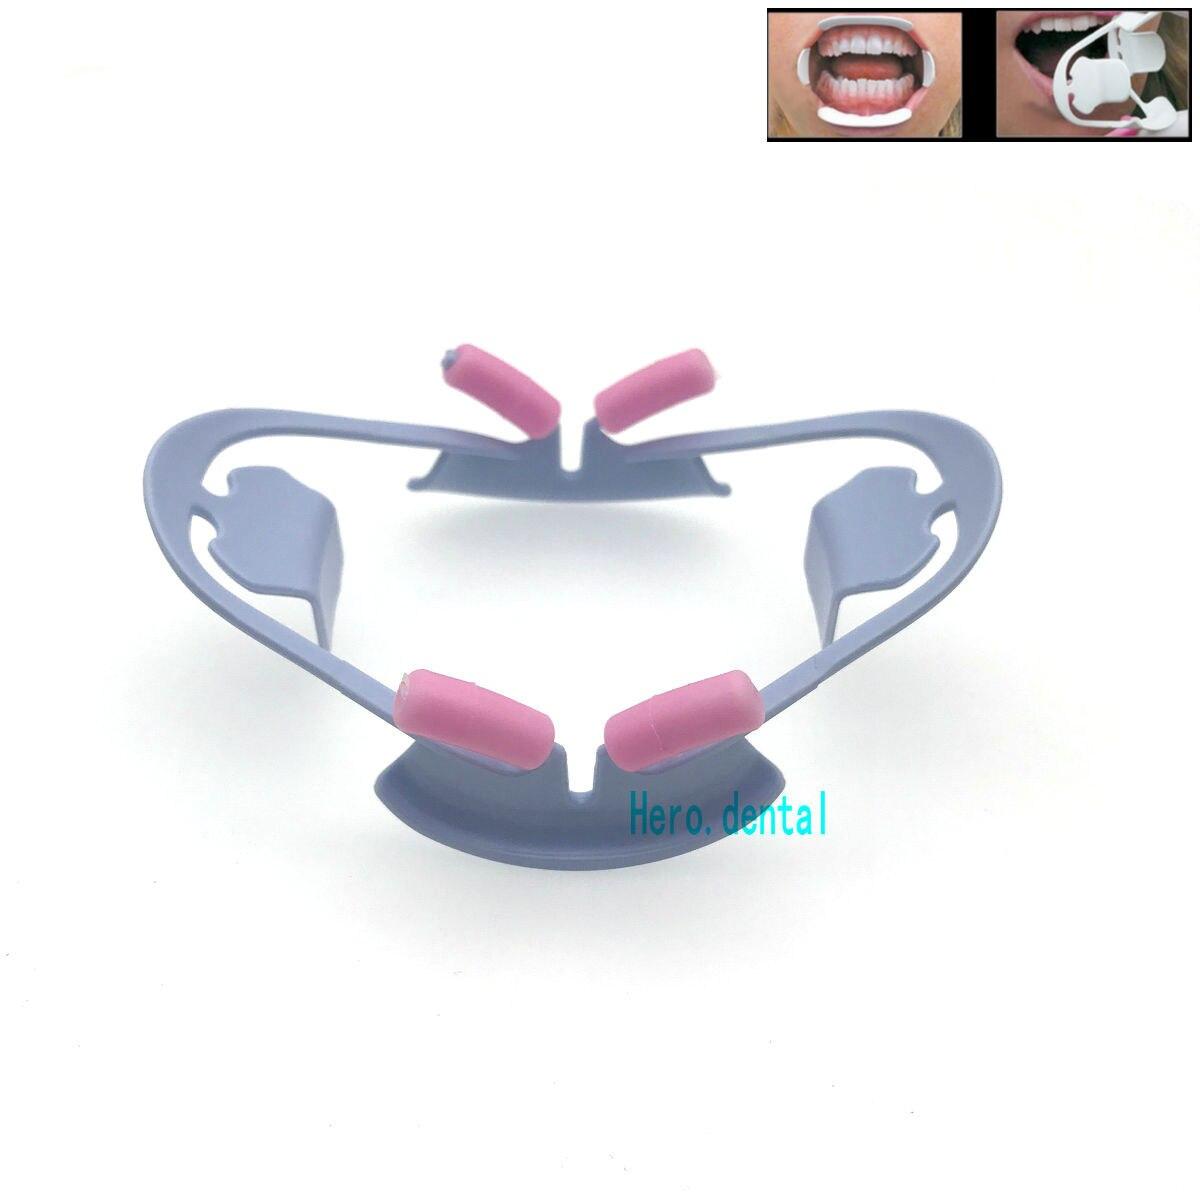 Oral Intraoral Cheek Lip Retractor Opener Mouth Prop Dental Orthodontic Adult 3D